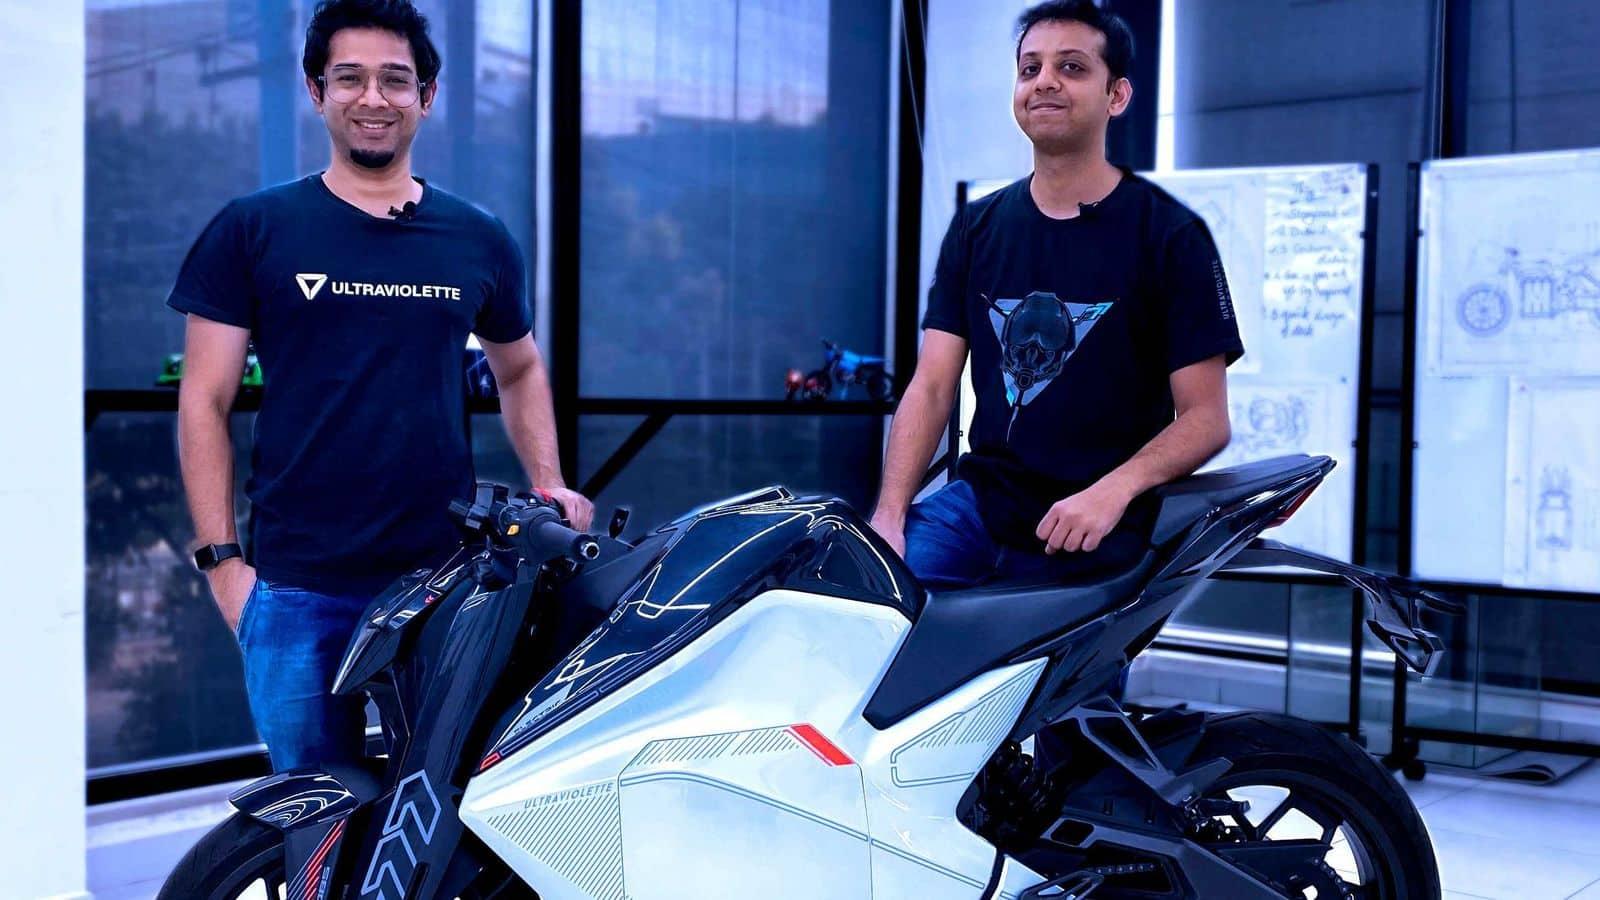 Electric bike startup Ultraviolette